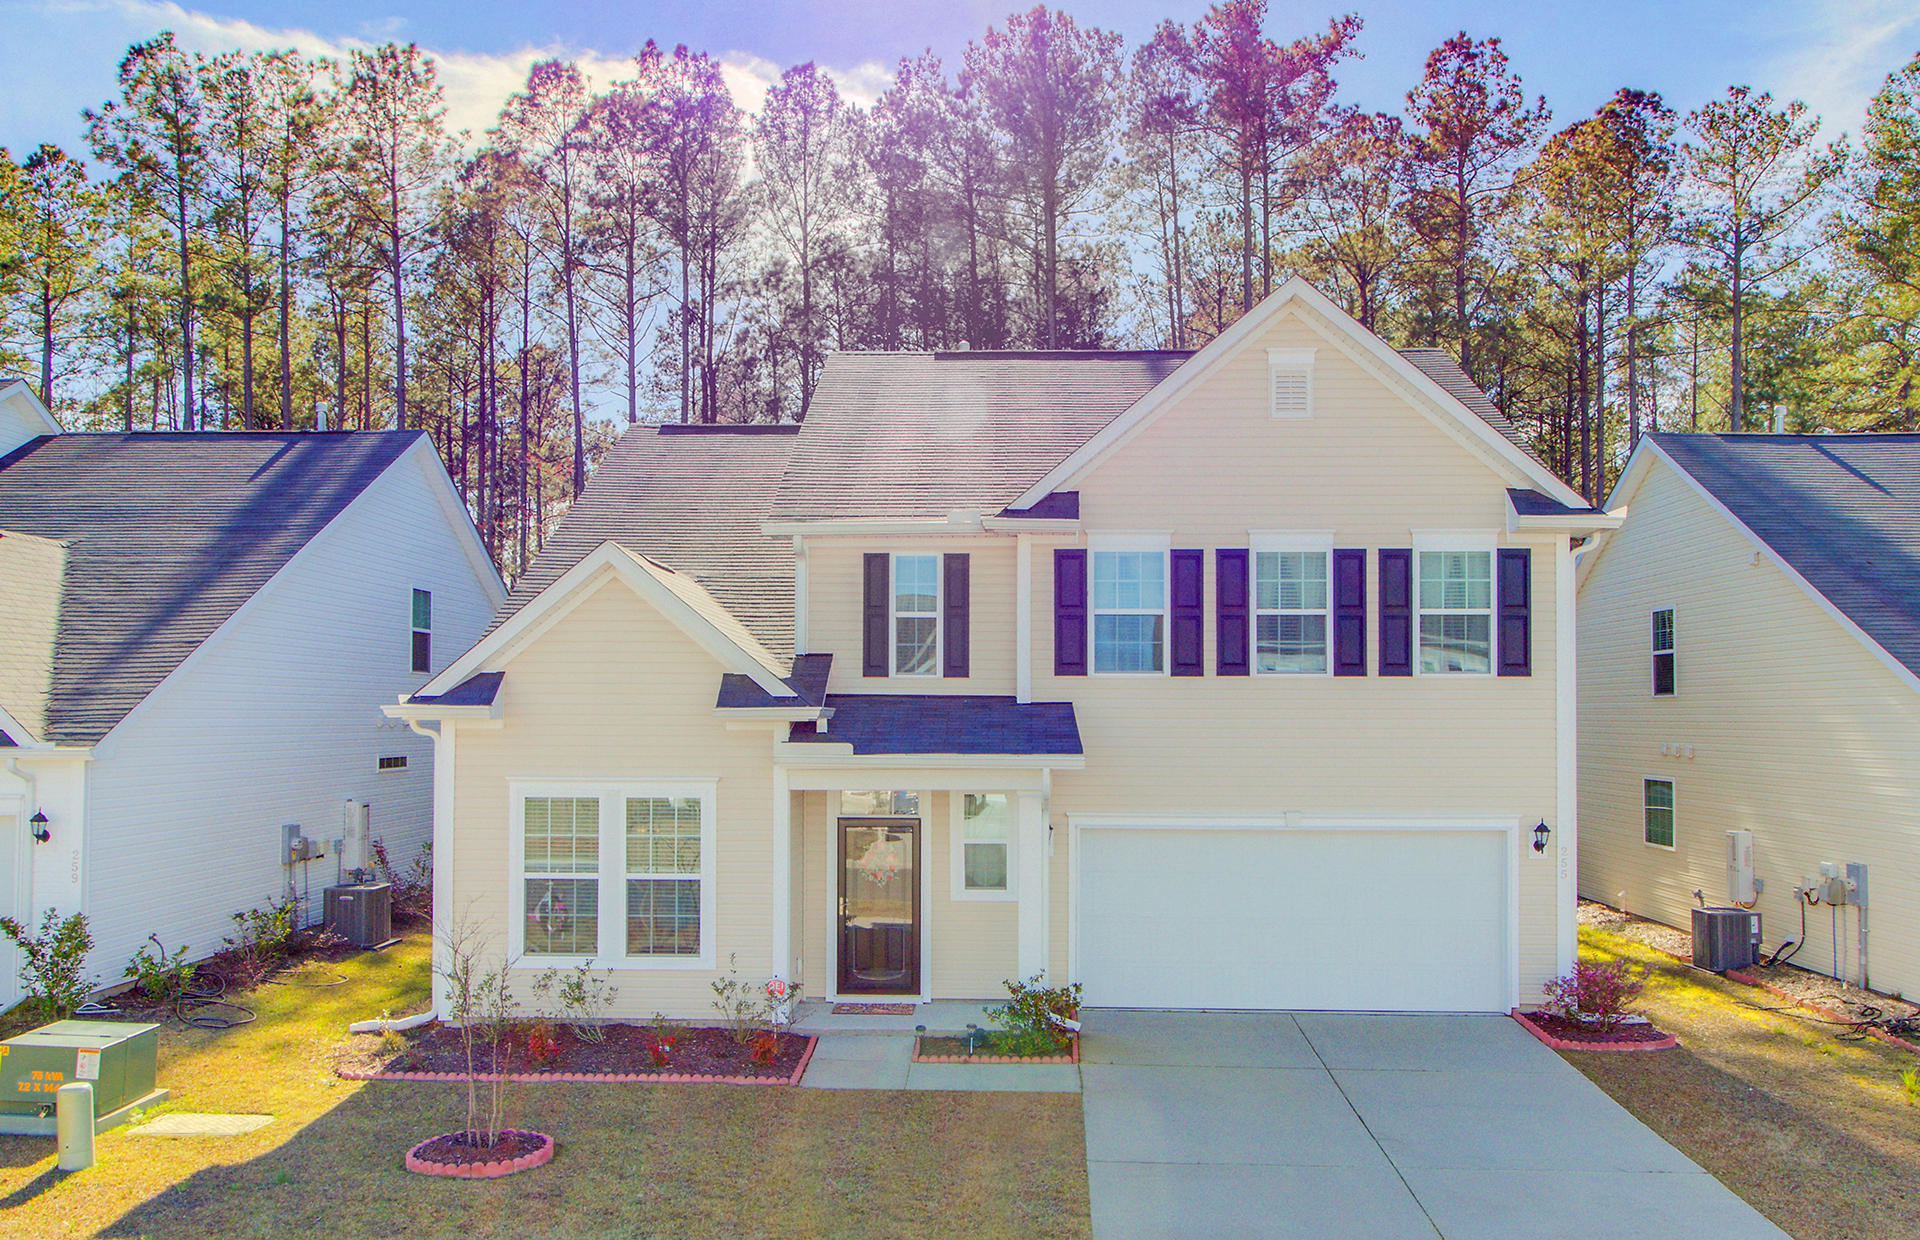 Cane Bay Plantation Homes For Sale - 255 Spectrum, Summerville, SC - 0